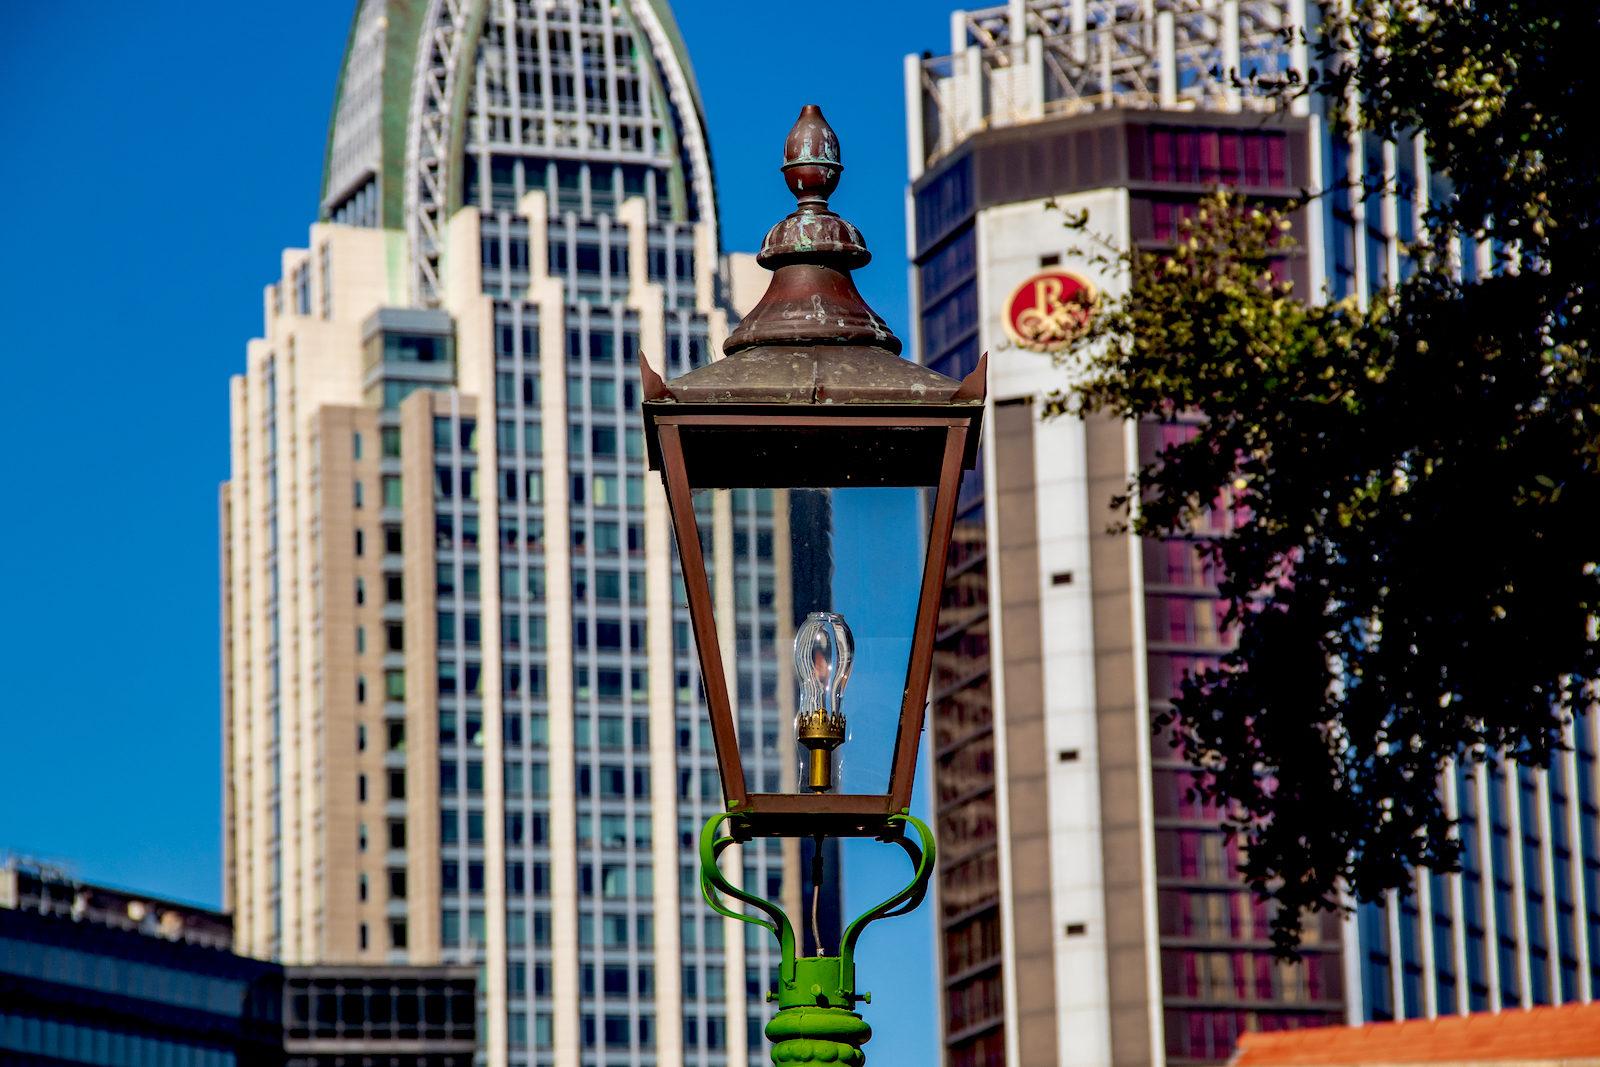 Lantern in Downtown Mobile, AL